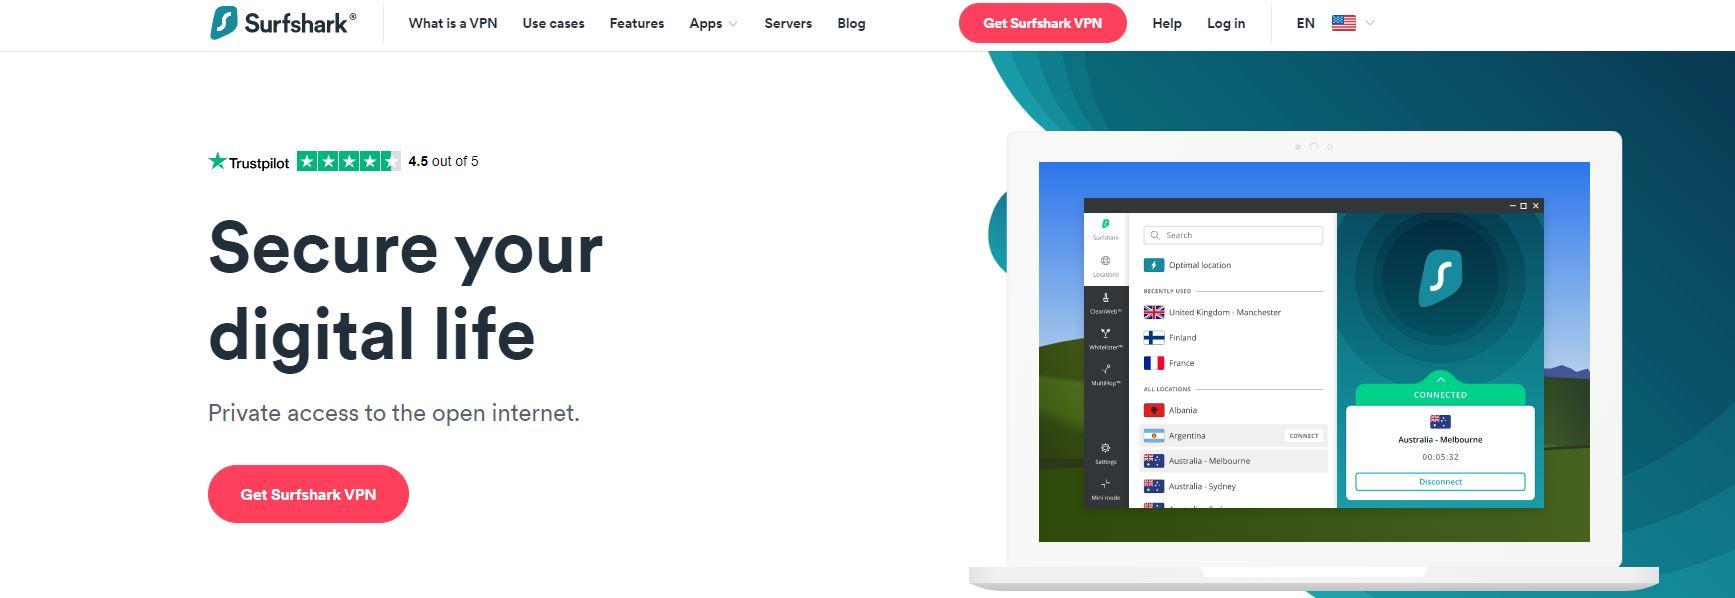 Surfshark VPN website